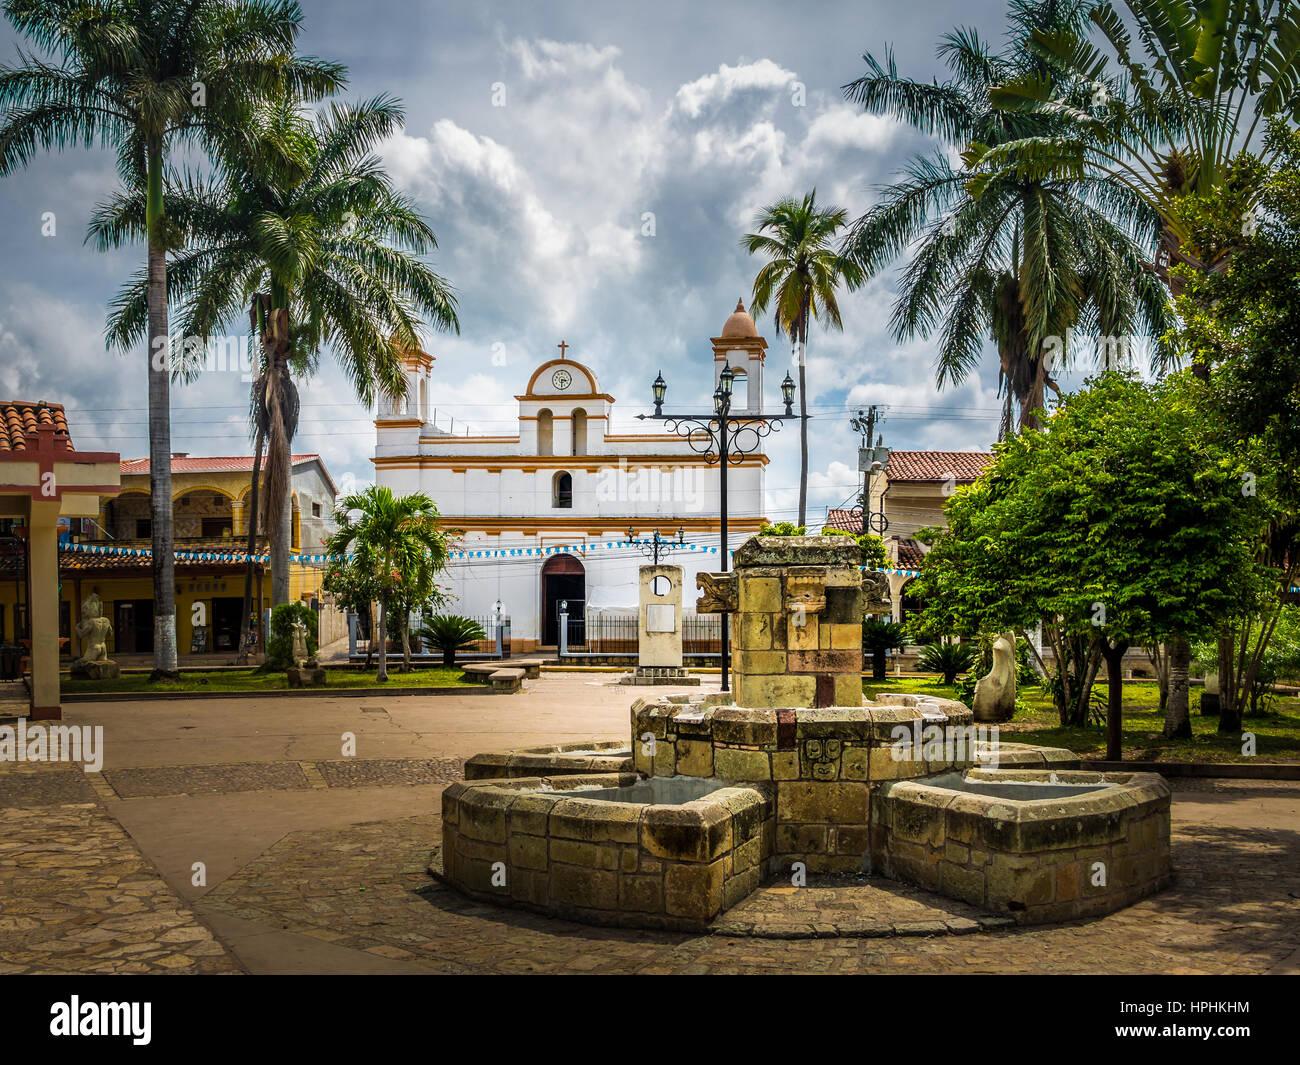 Main square of Copan Ruinas City, Honduras - Stock Image